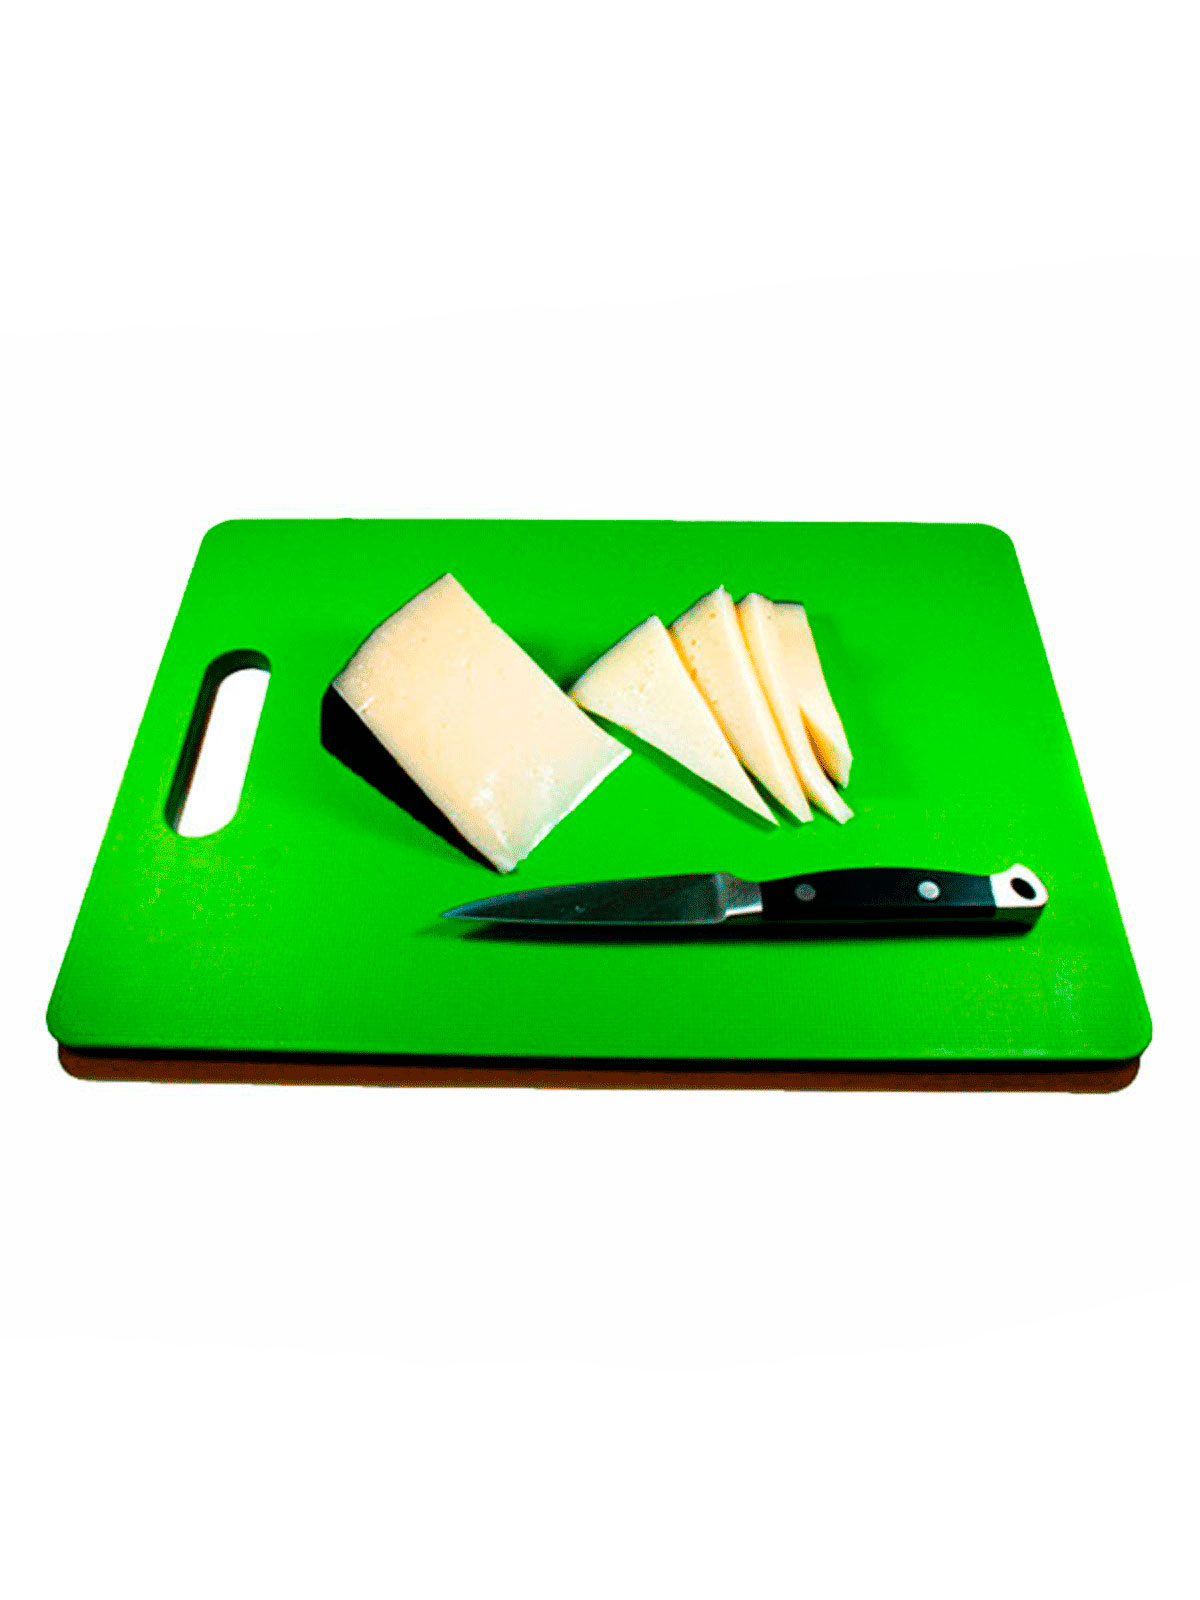 Jjgjrgt012sw 1 tabla cortar verde comprar tienda online for Menaje cocina online